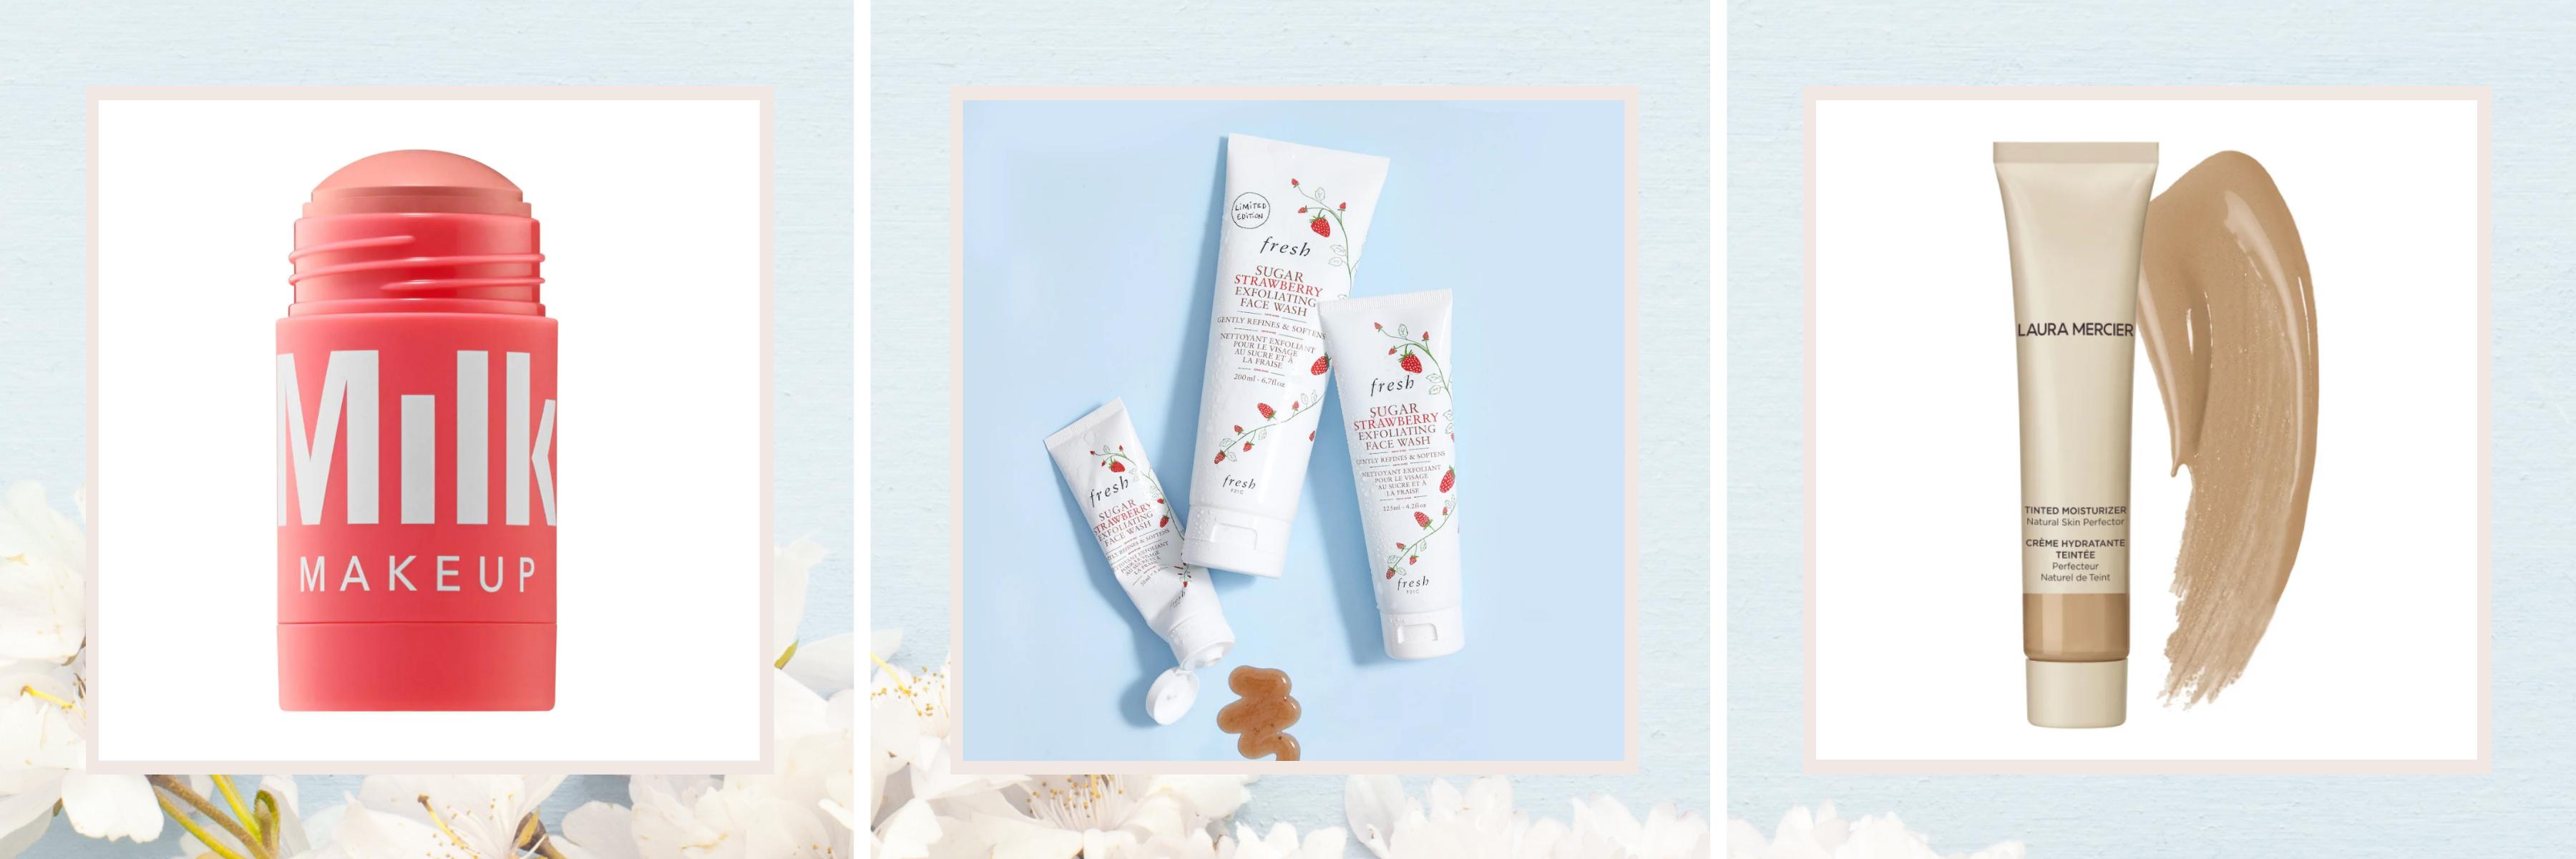 Skincare - Face mask, face wash & tinted moisturizer